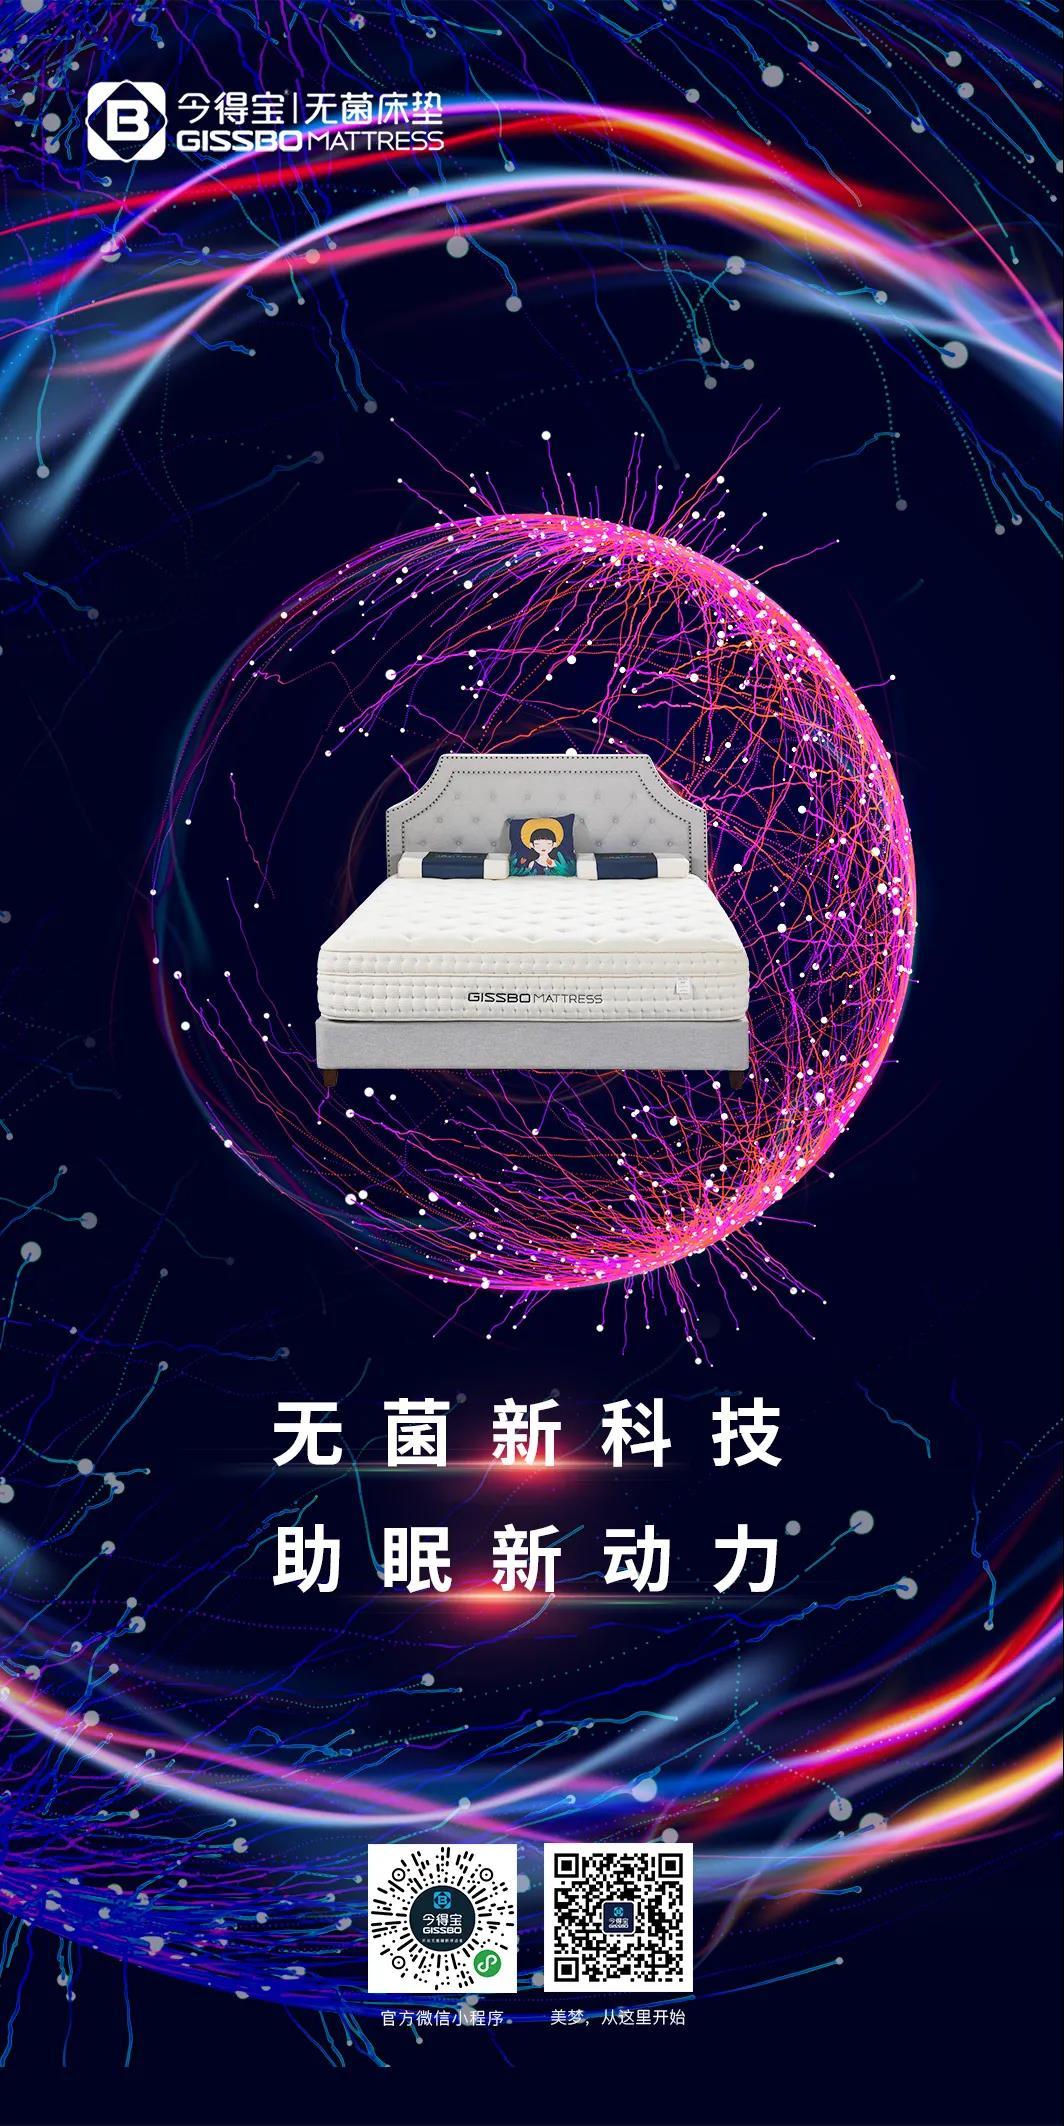 sleep economy in cina: materasso intelligente